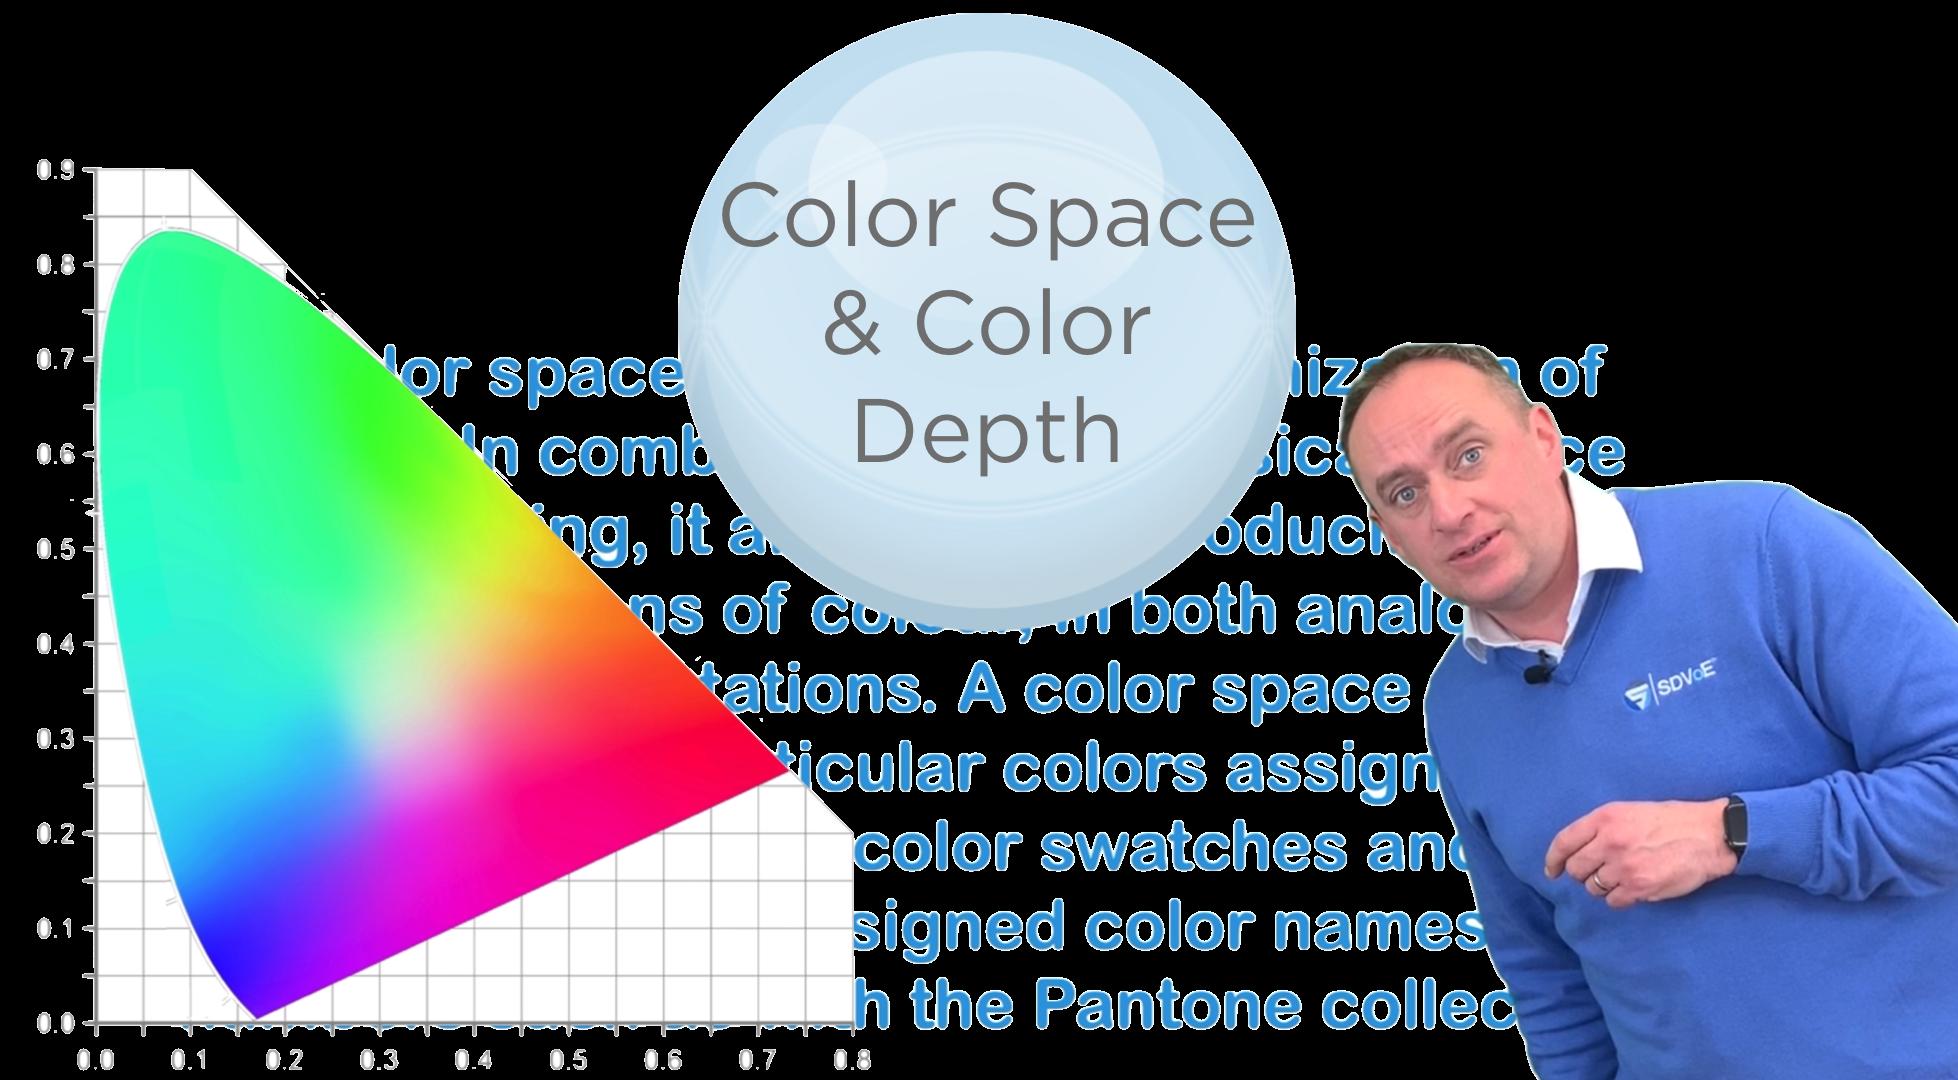 Color Space & Color Depth